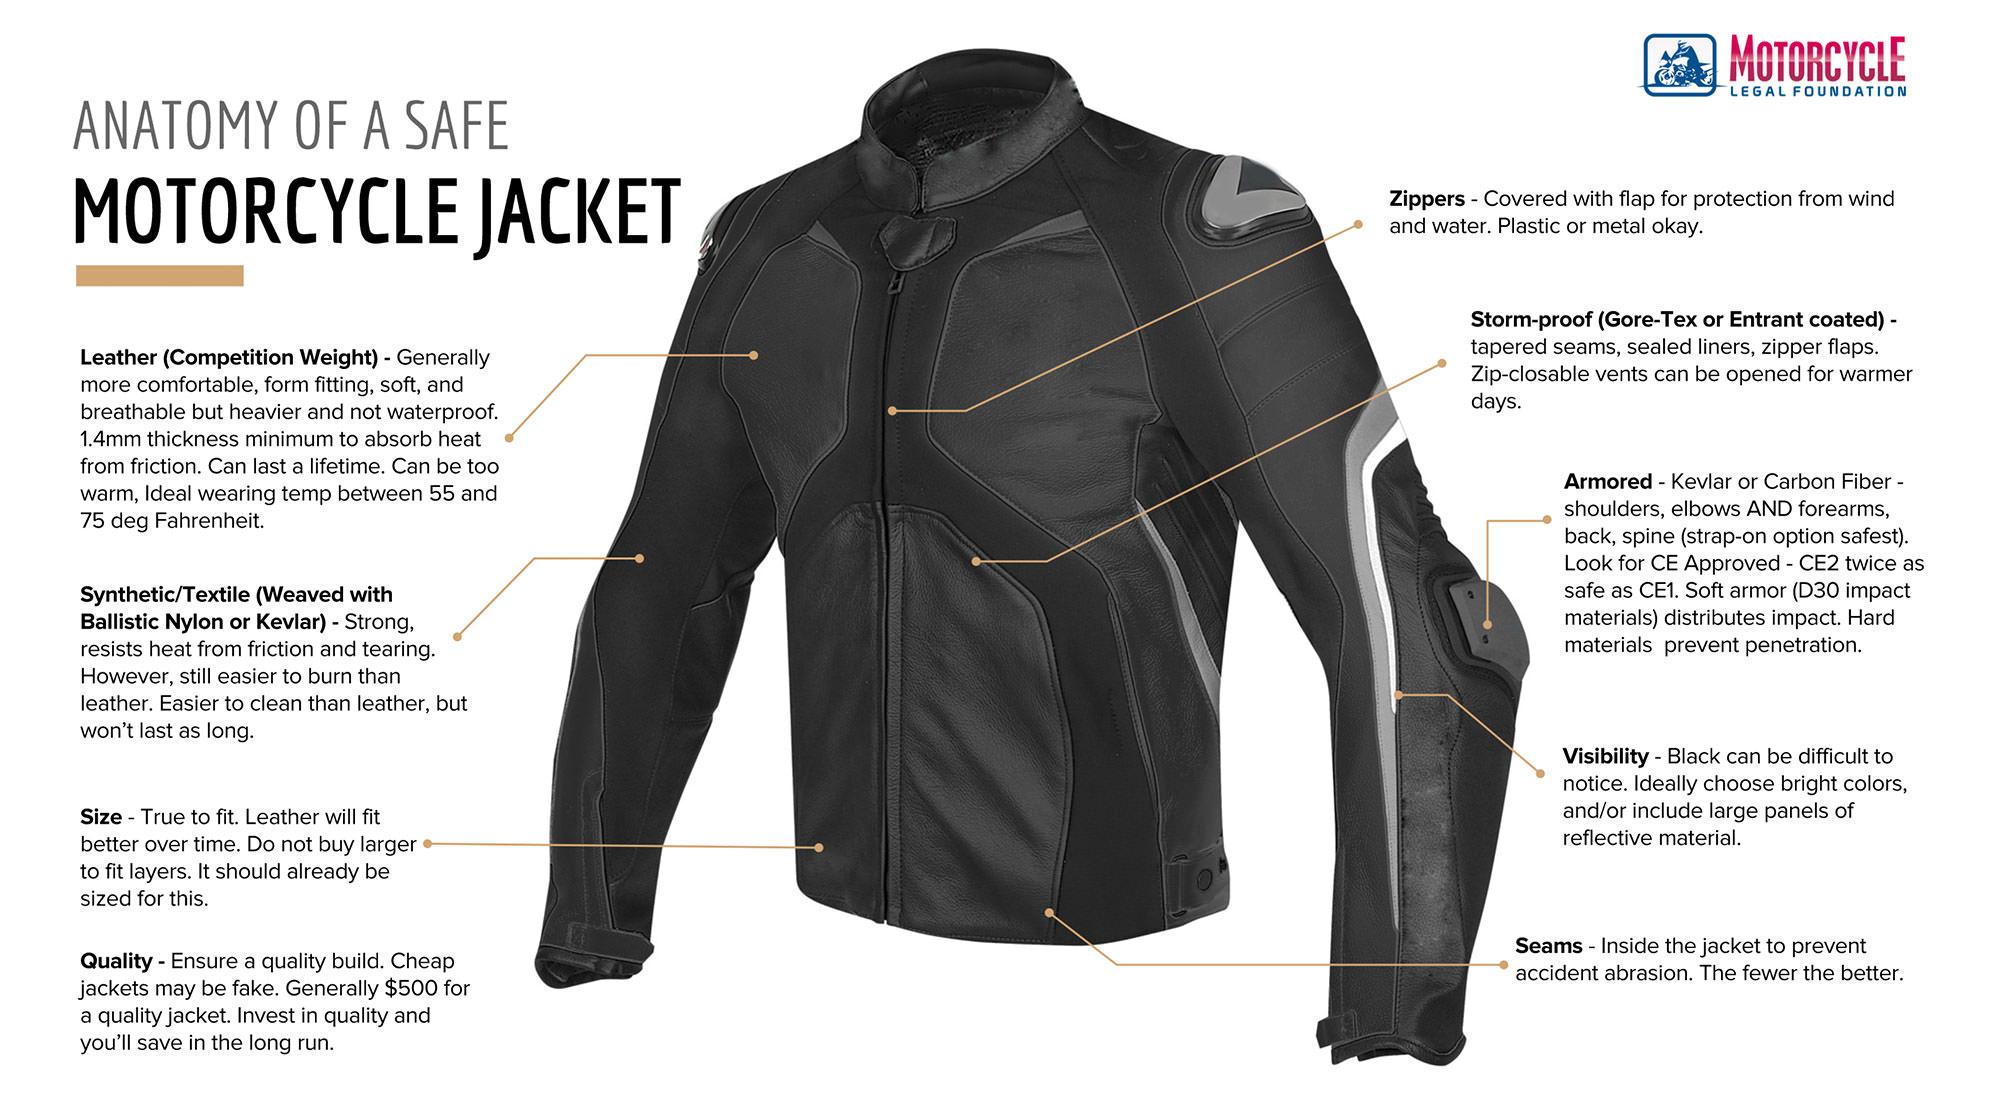 Anatomy of a Safe Motorcycle Jacket